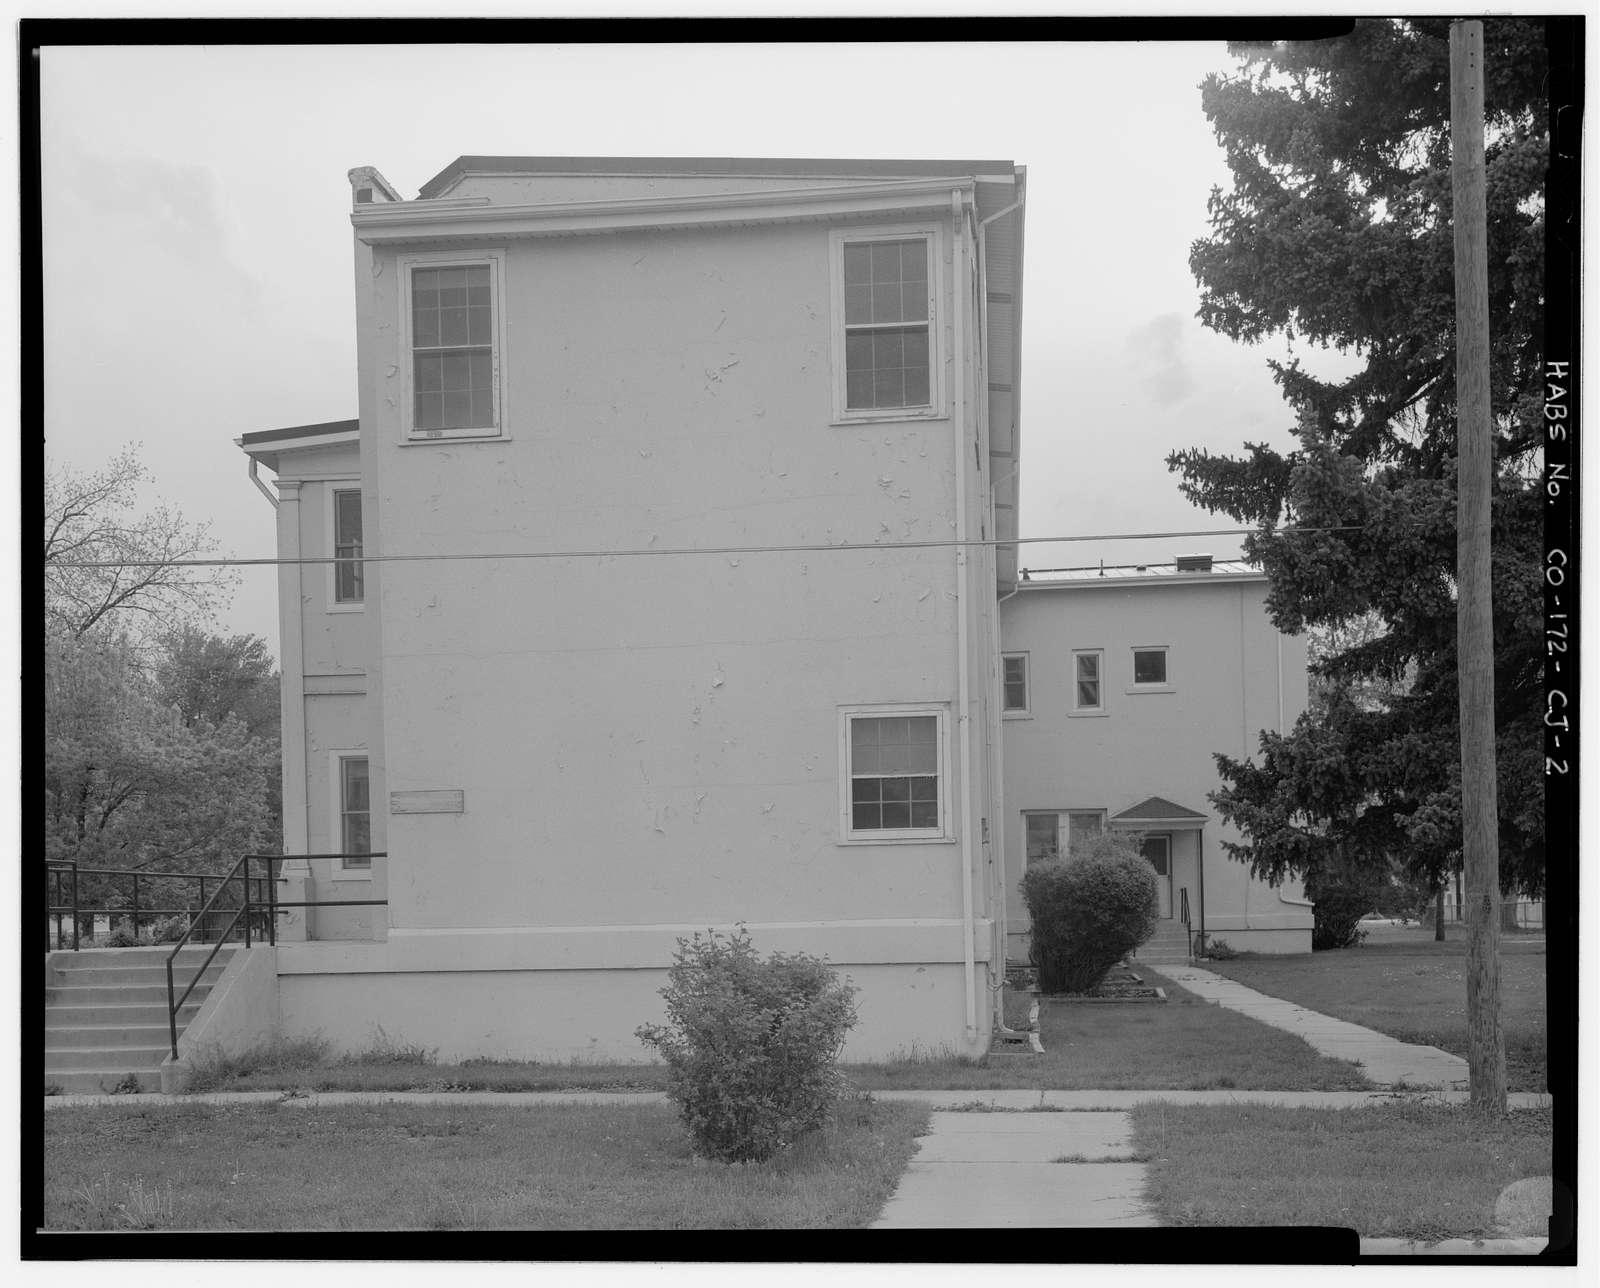 Fitzsimons General Hospital, Open Air Tuberculosis Ward, West Pennington Avenue & North Hickey Street Southwest Corner, Aurora, Adams County, CO